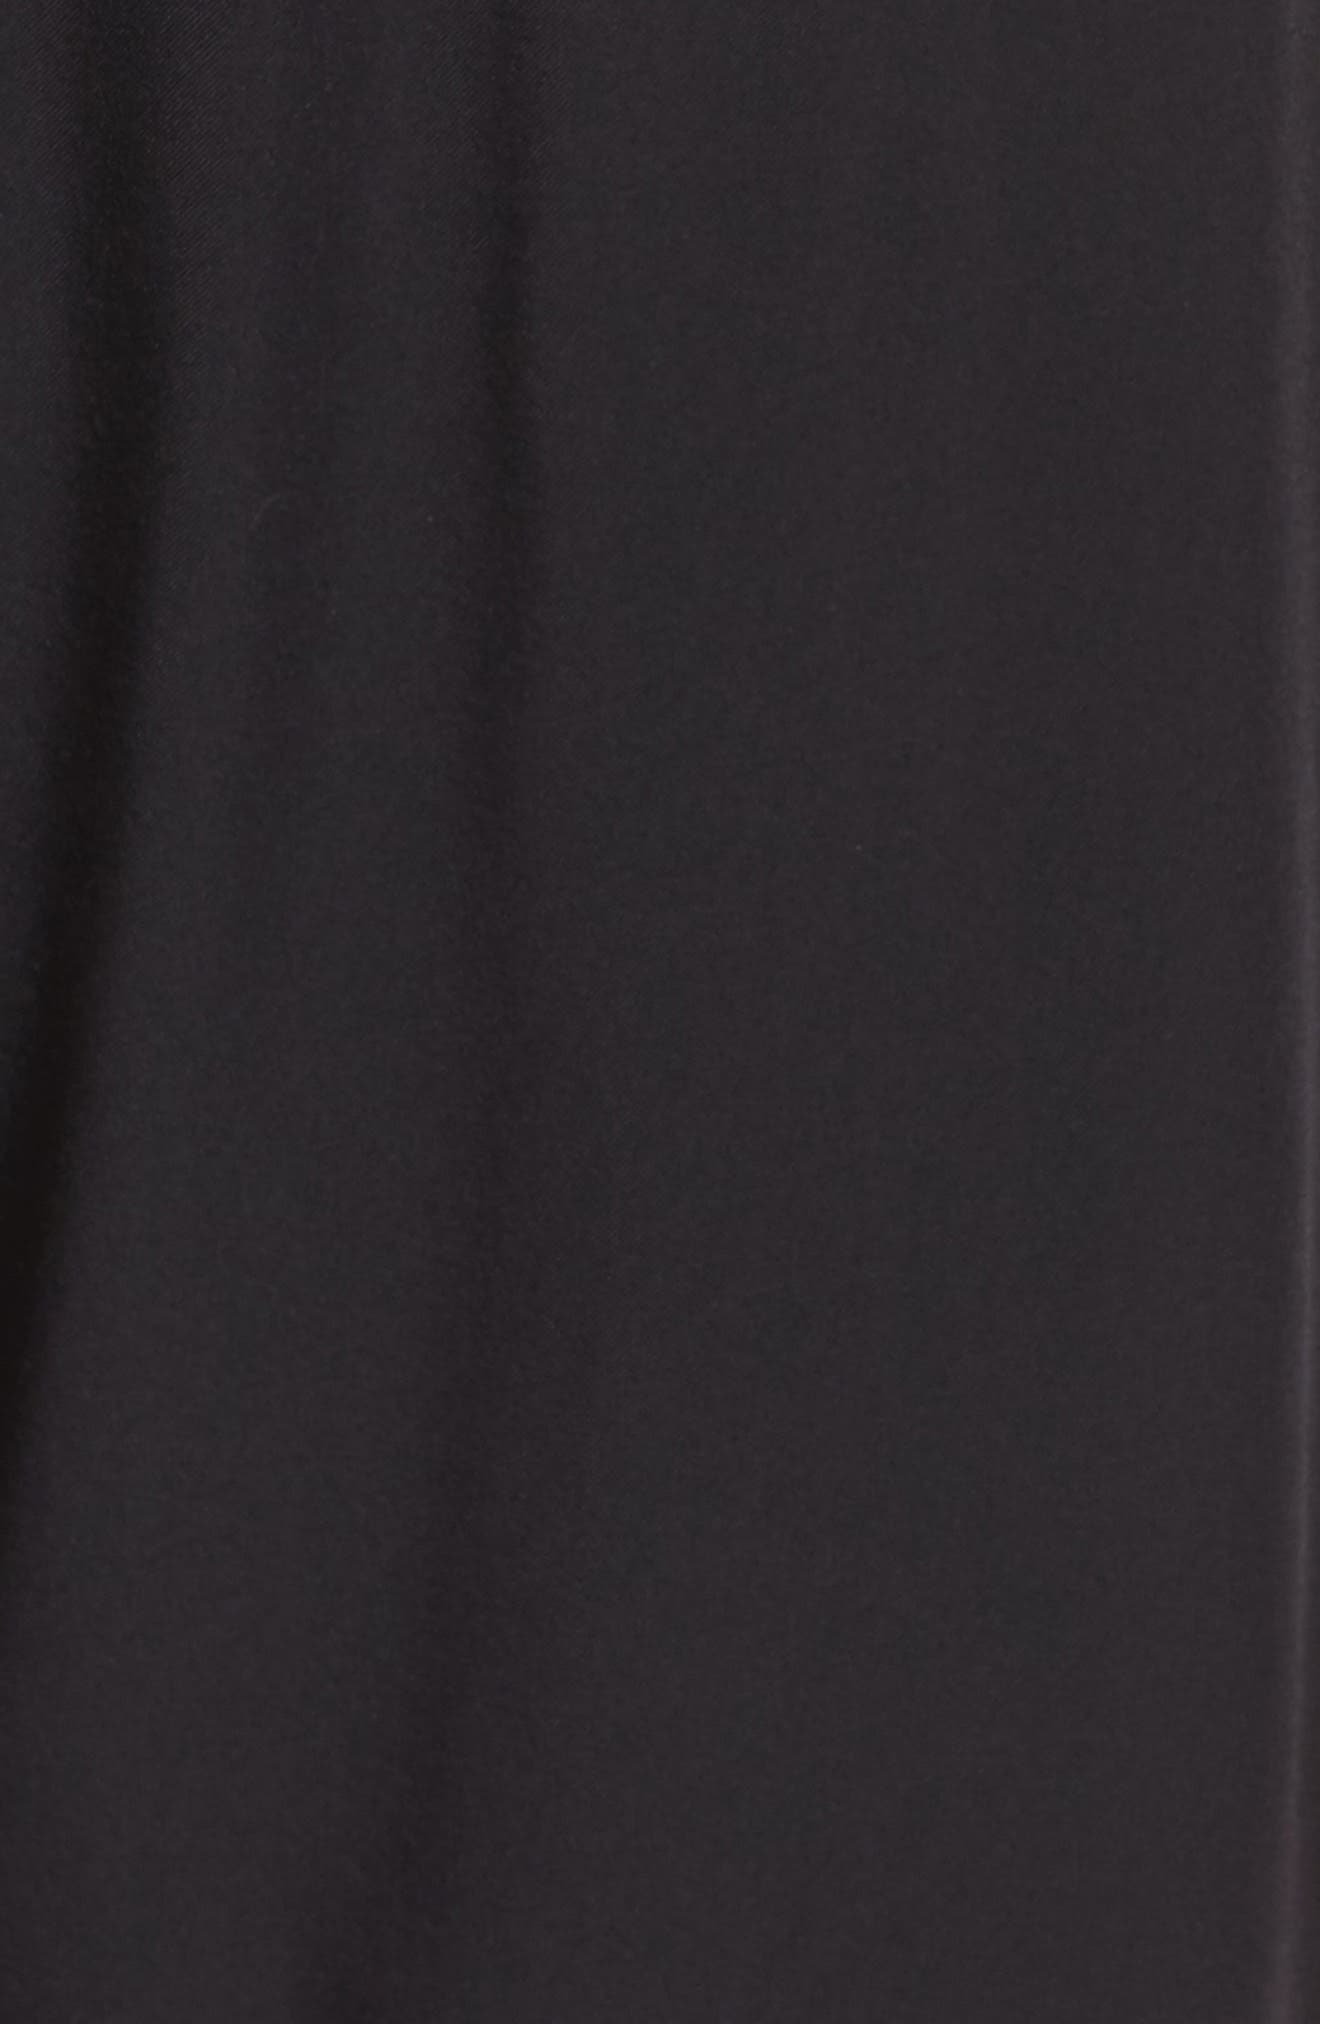 NikeLab Stretch Woven Training Pants,                             Alternate thumbnail 6, color,                             Black/ Black